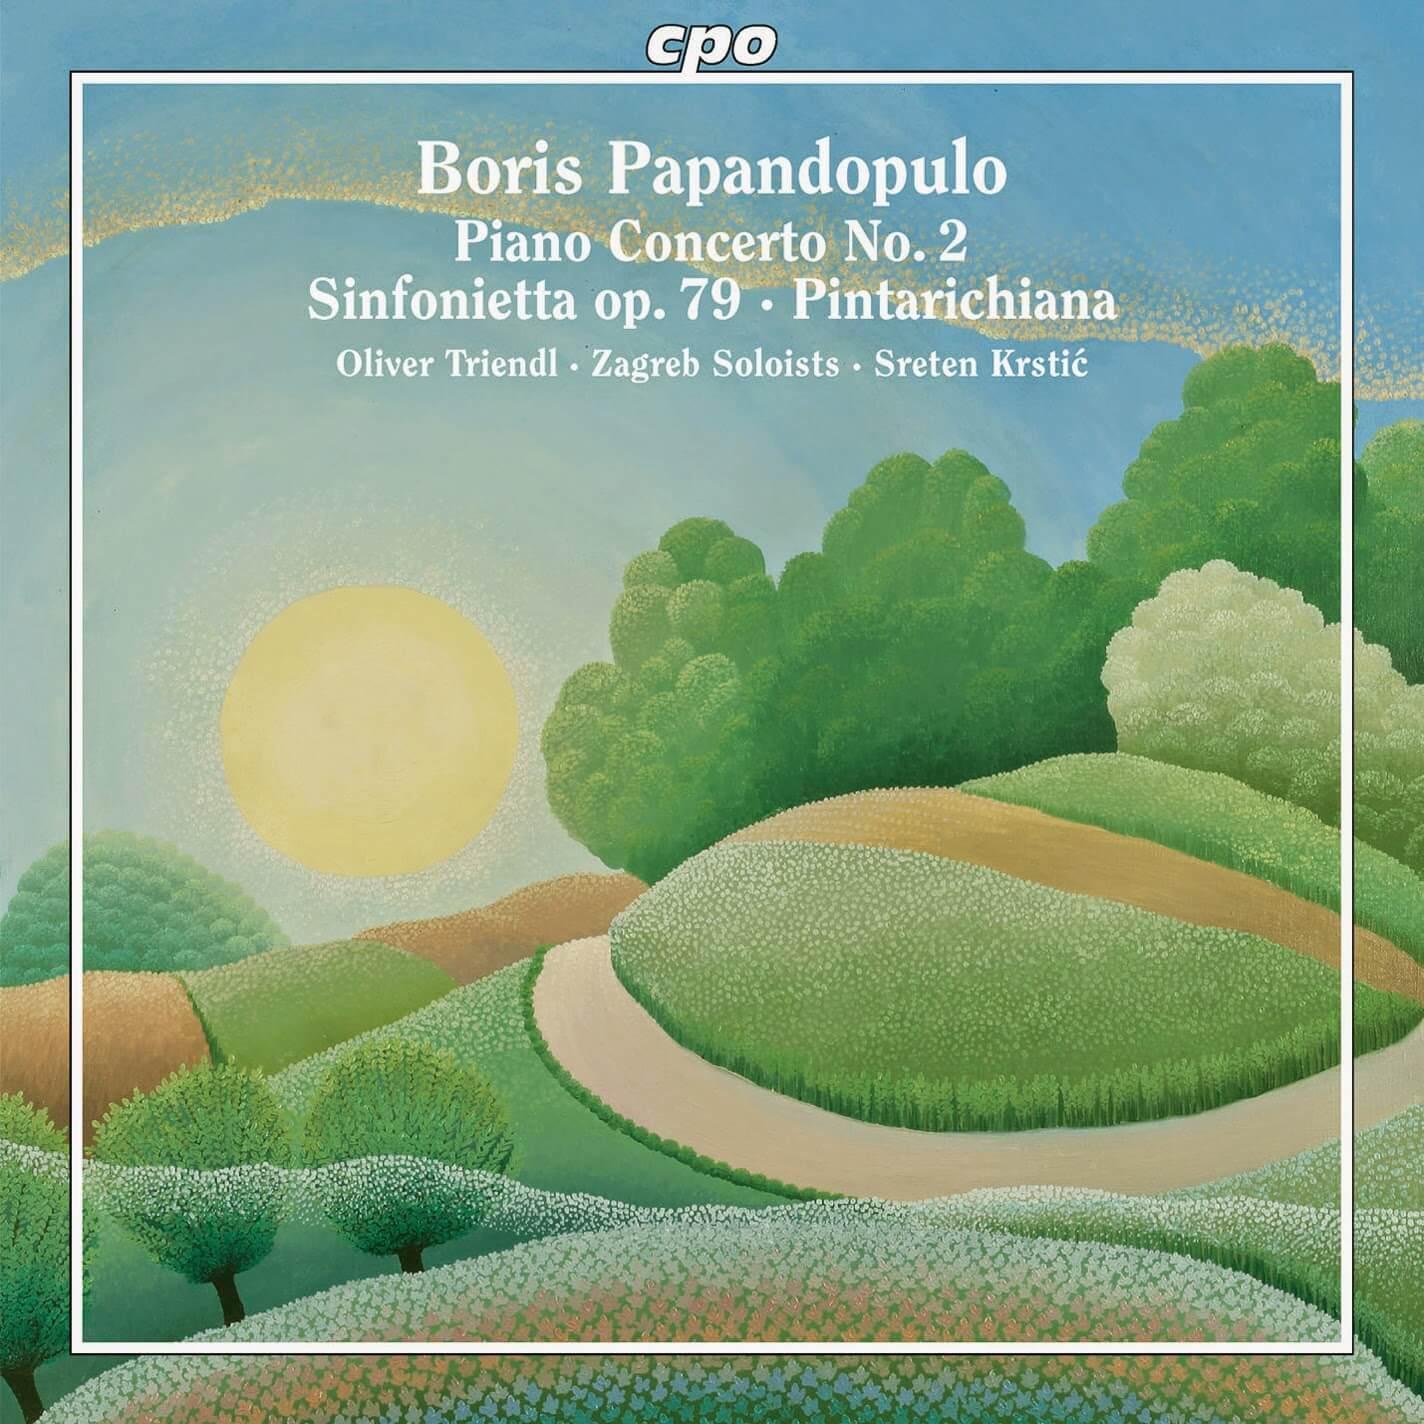 Zagrebacki solisti Recenti Boris Papandopulo